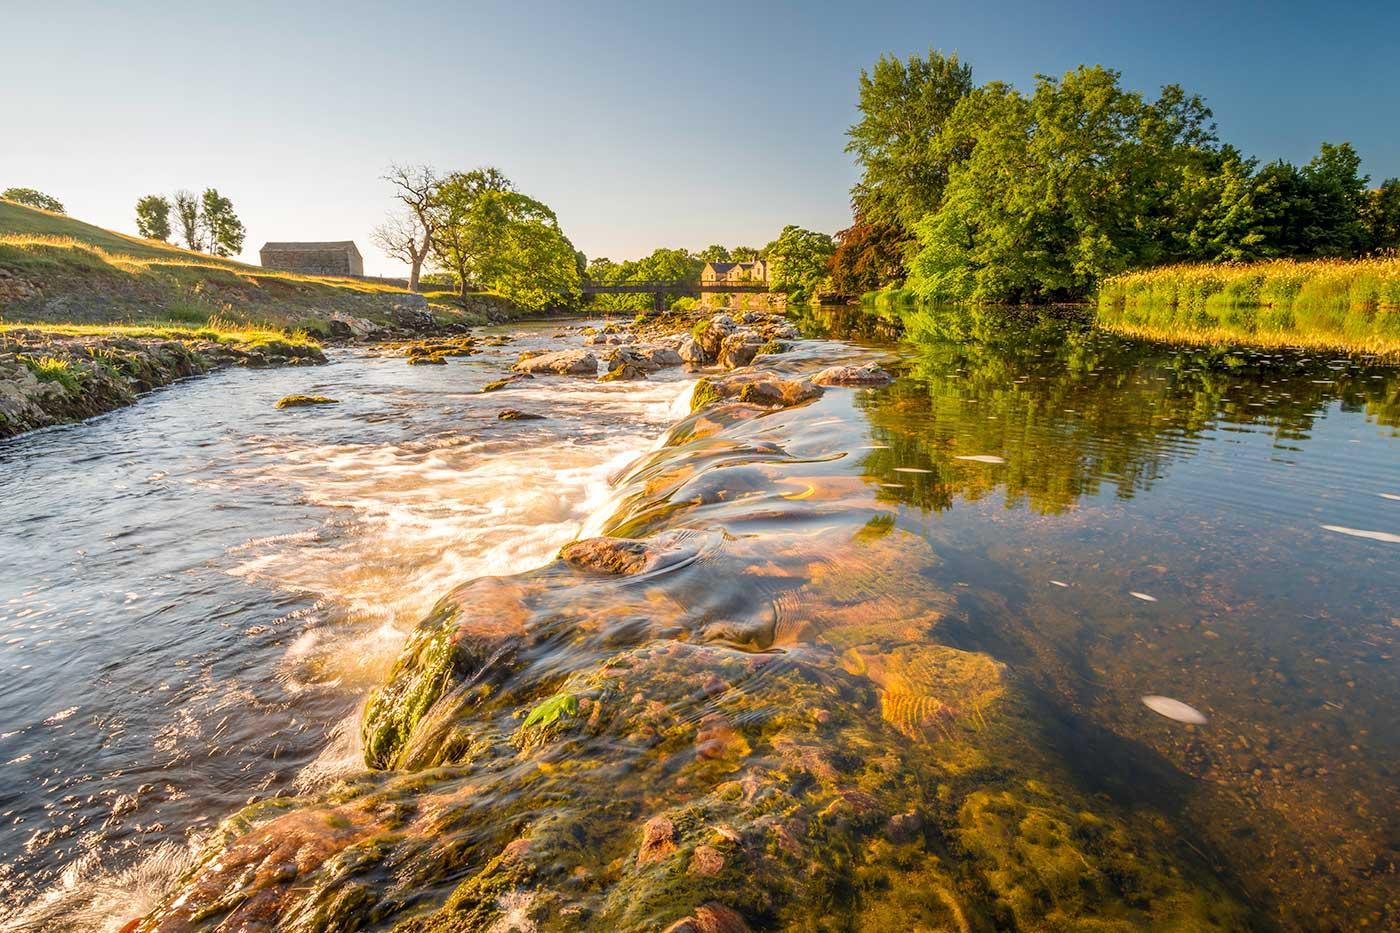 Linton Falls River Wharfe Yorkshire Dales